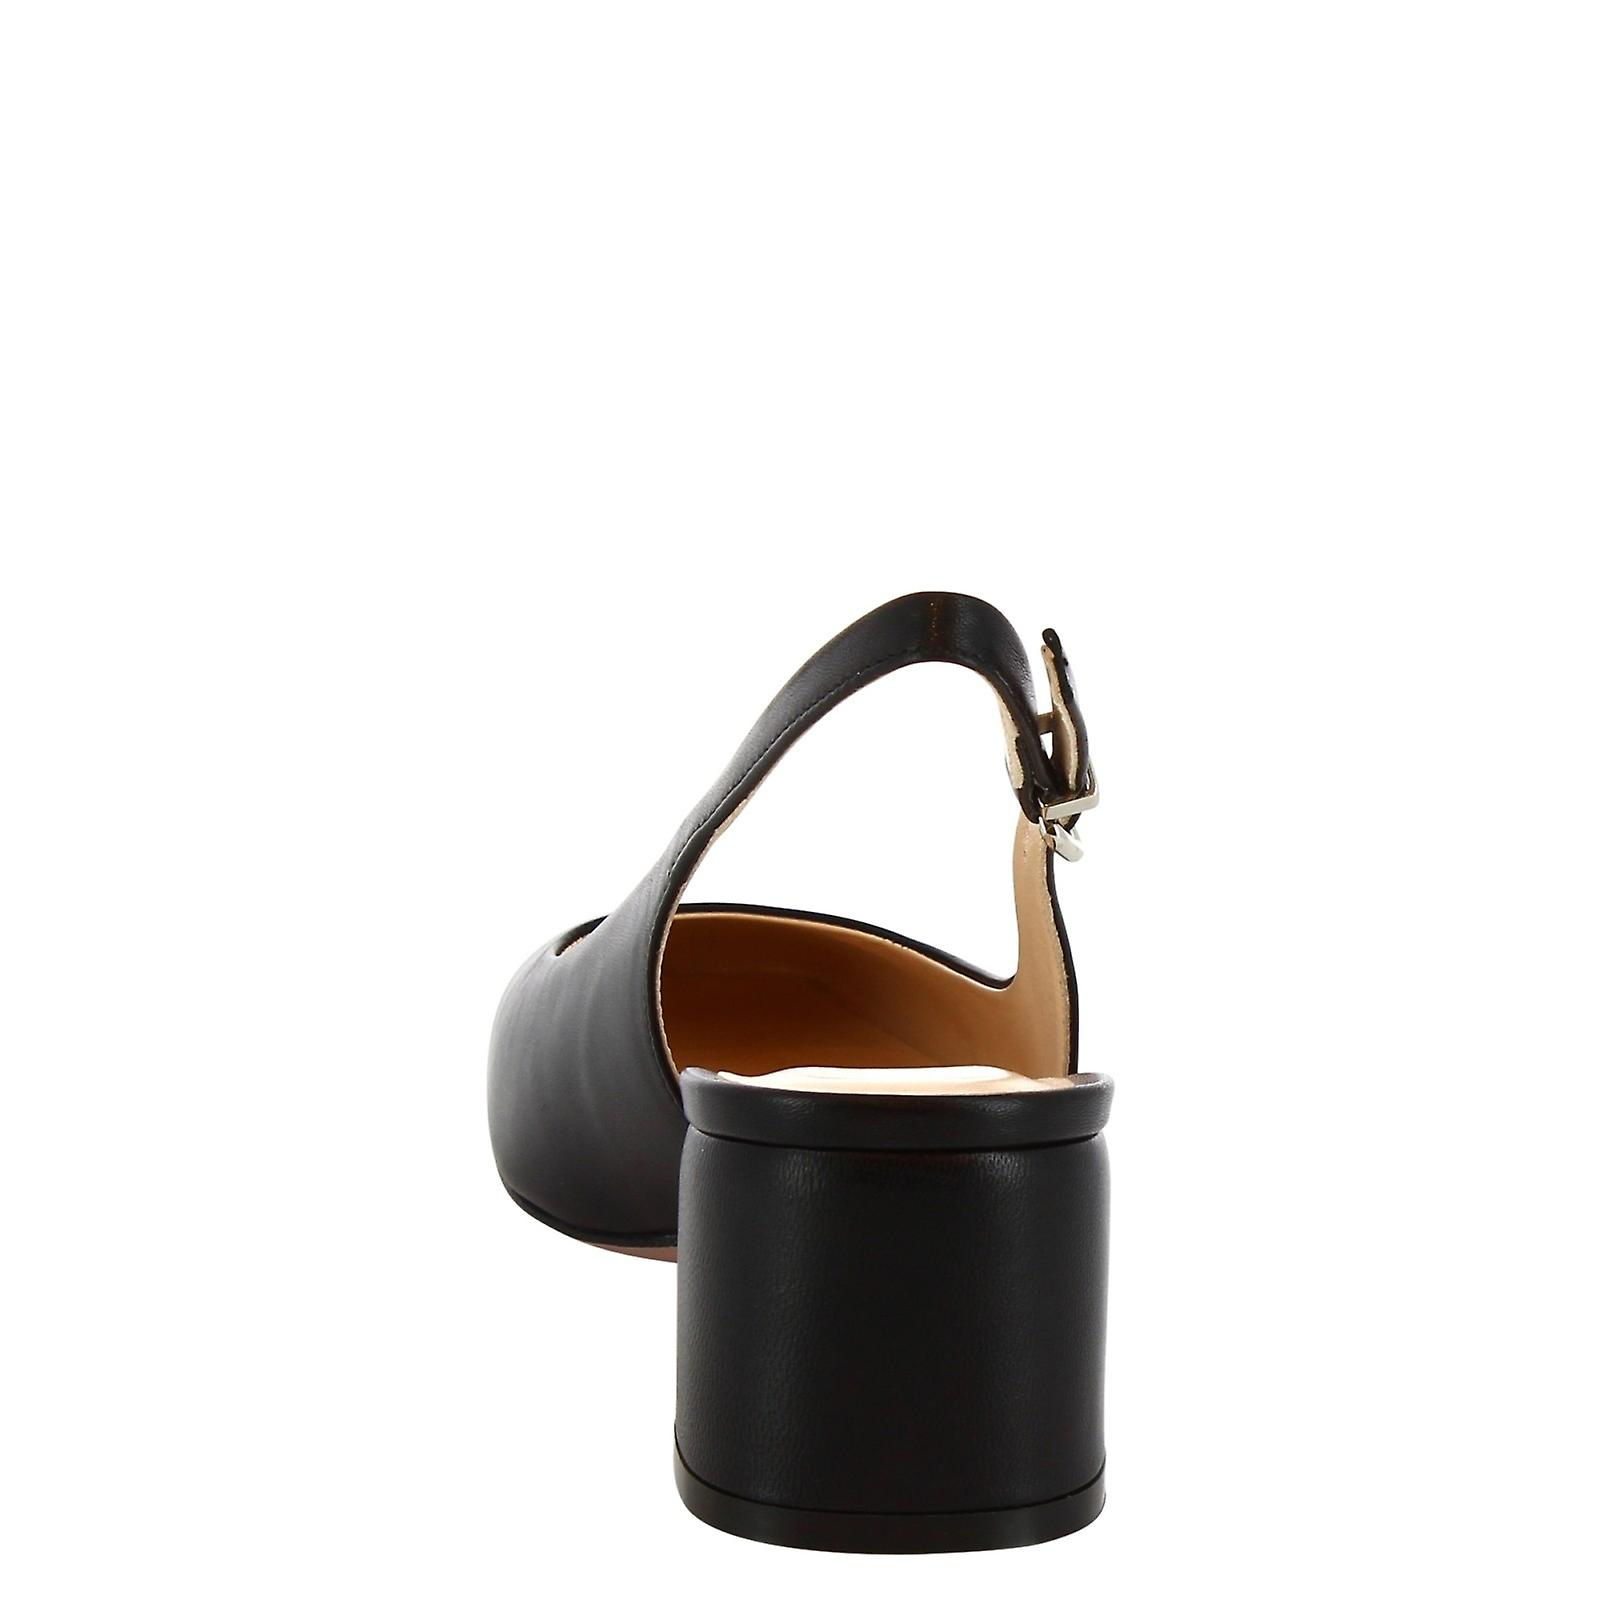 Leonardo Shoes Women's handmade slingback pumps shoes in black calf leather